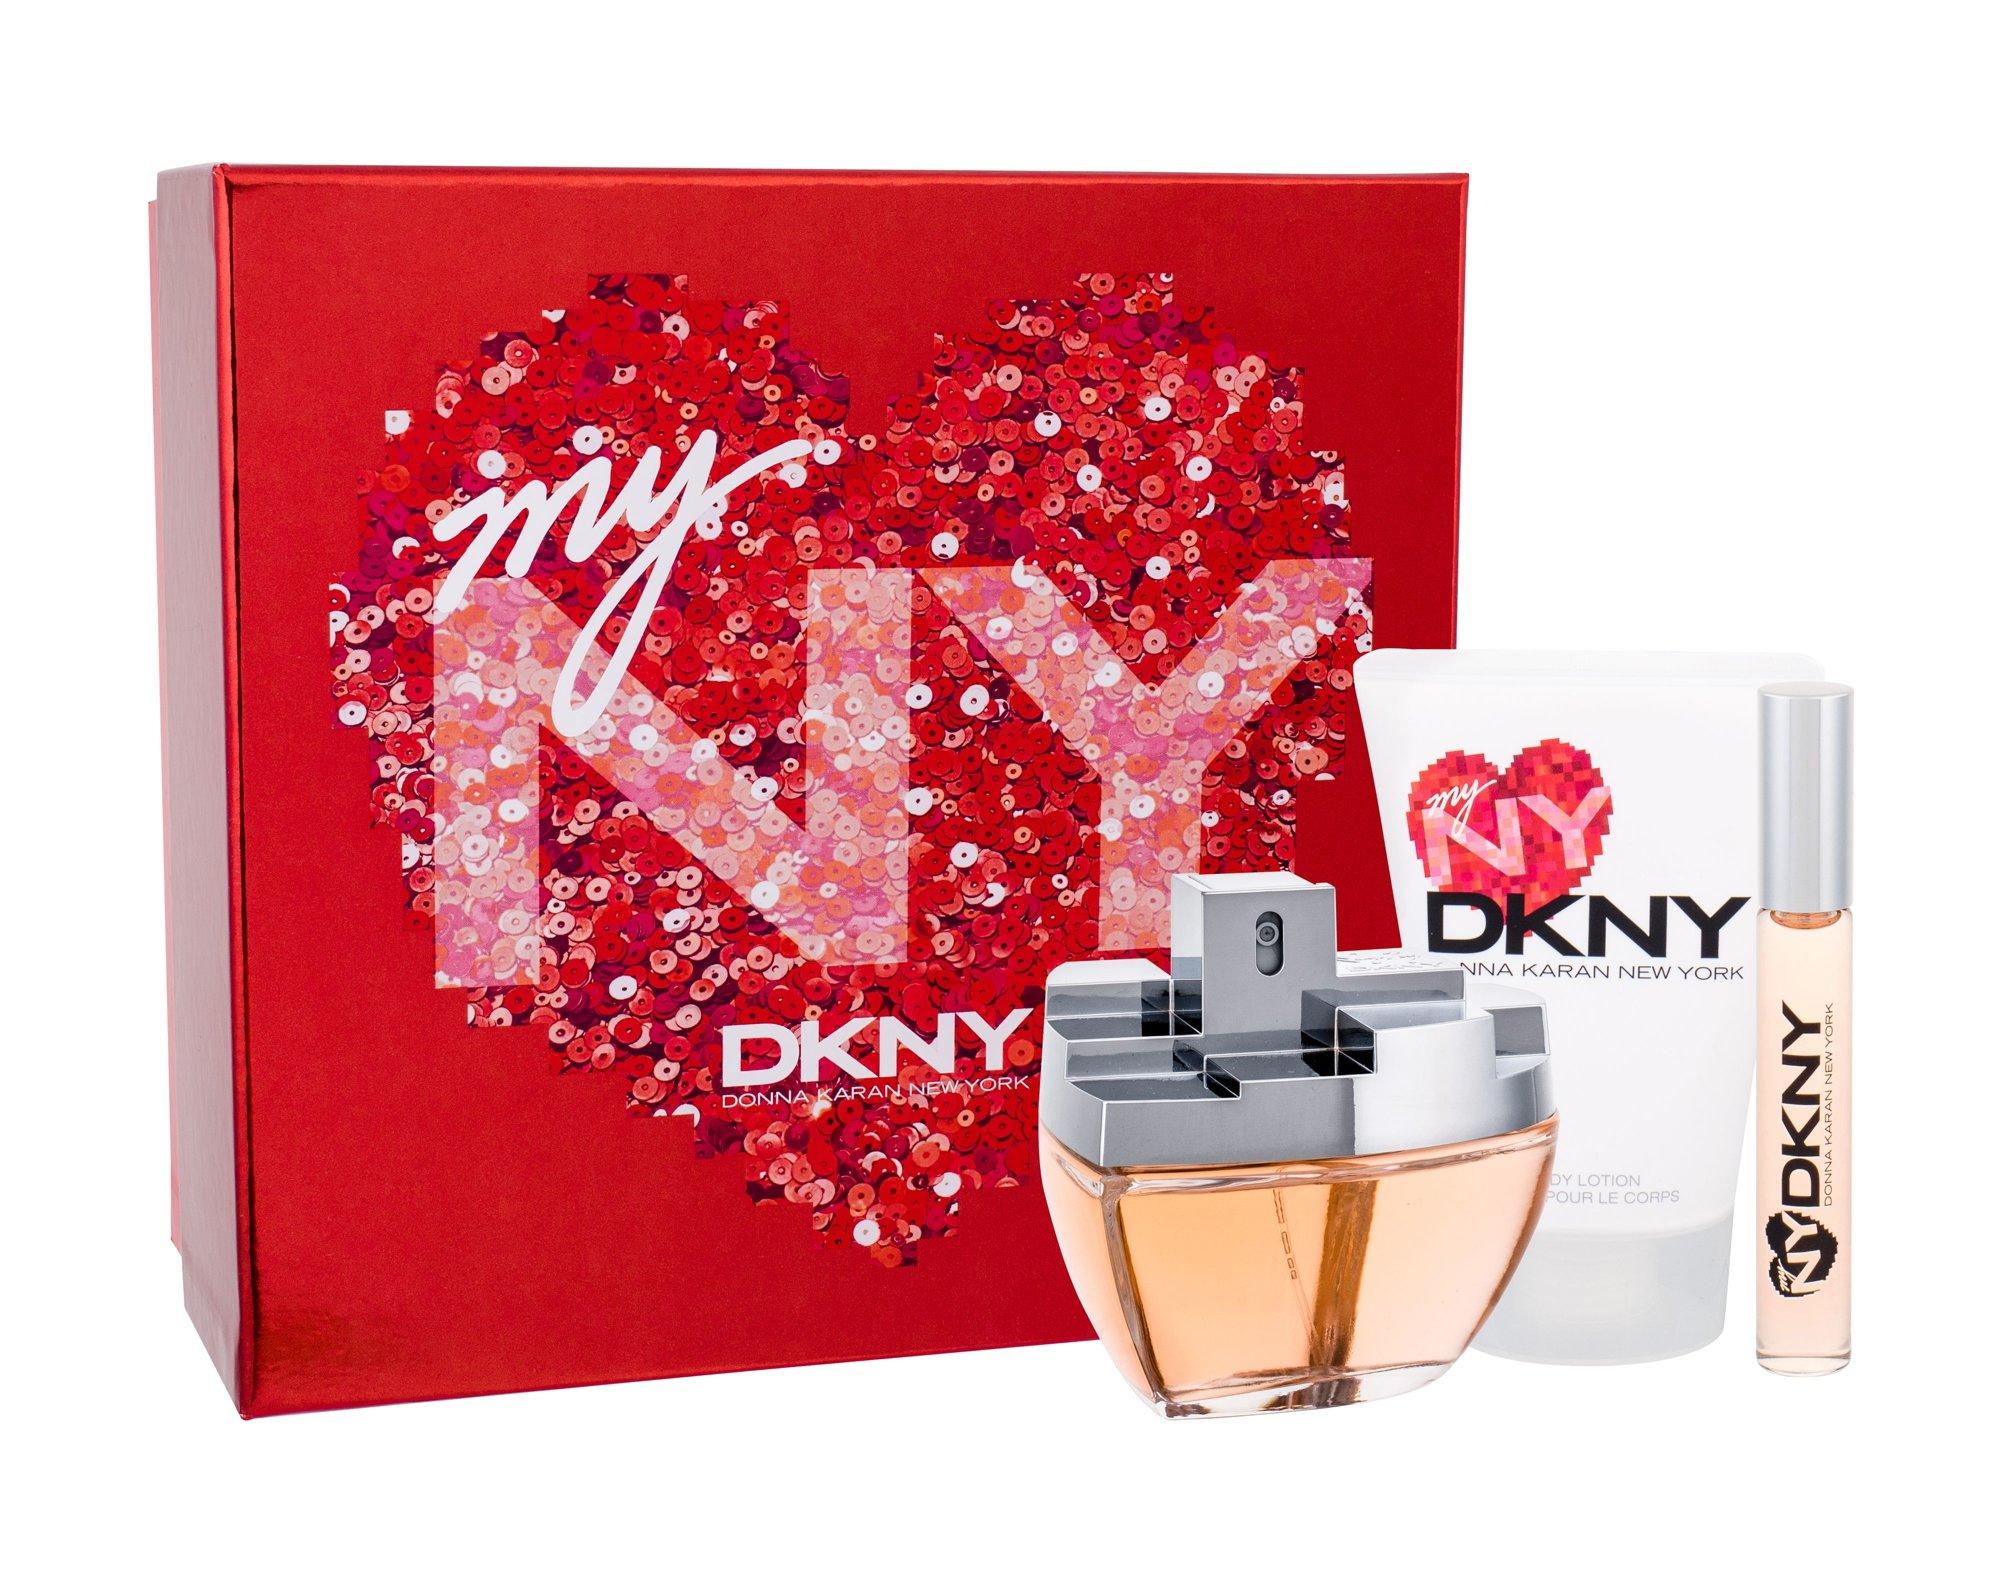 DKNY DKNY My NY Eau de Parfum 100ml